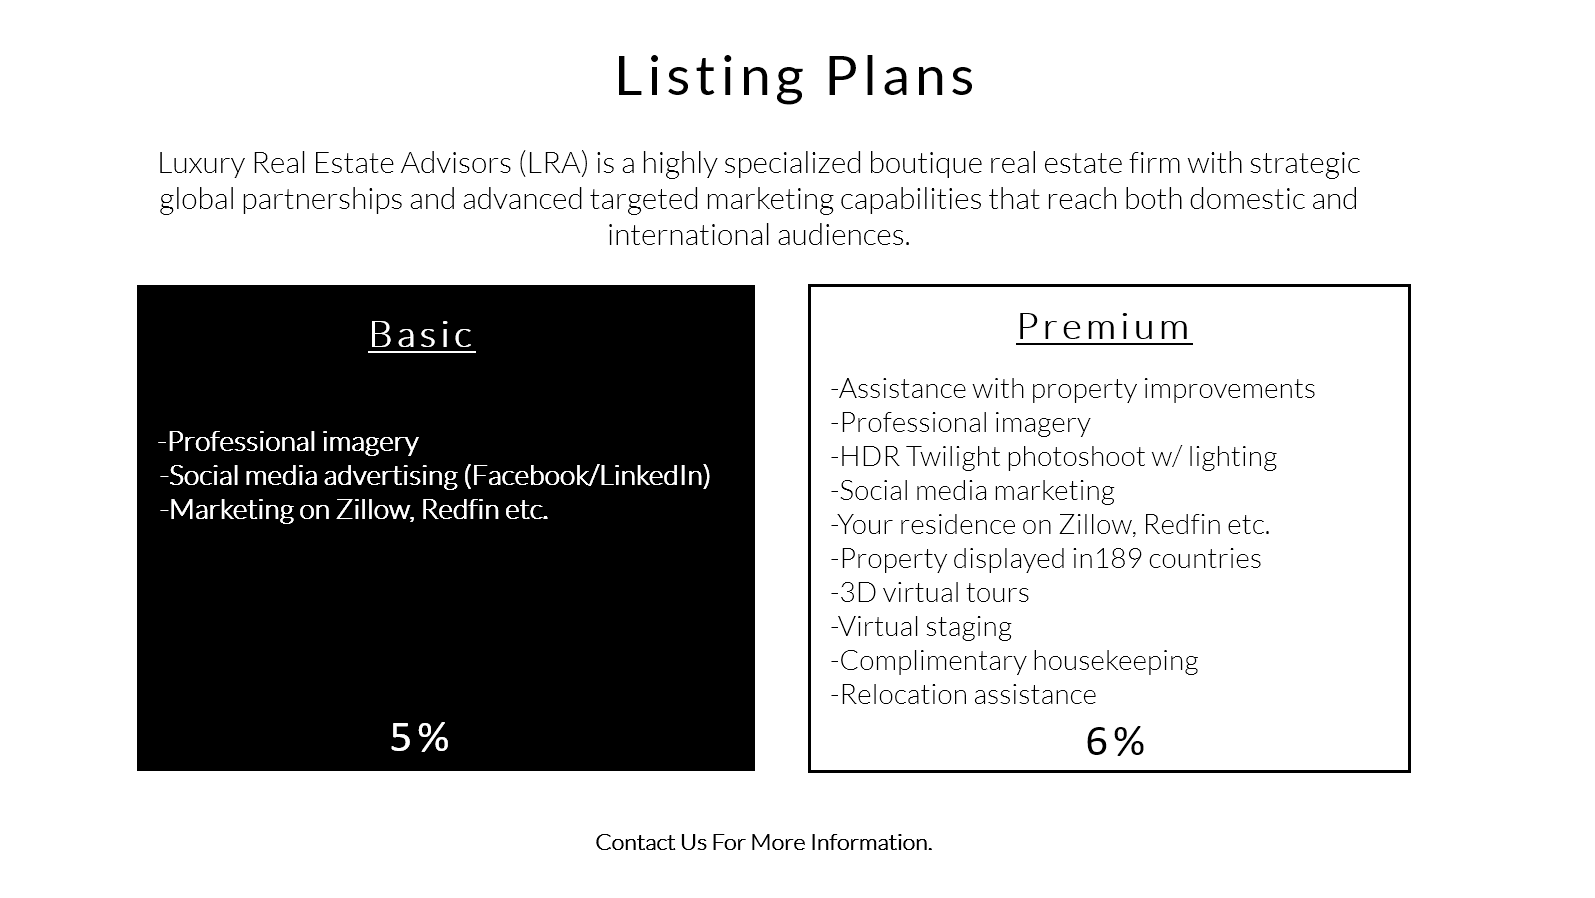 Luxury Real Estate Advisors Listing Plans